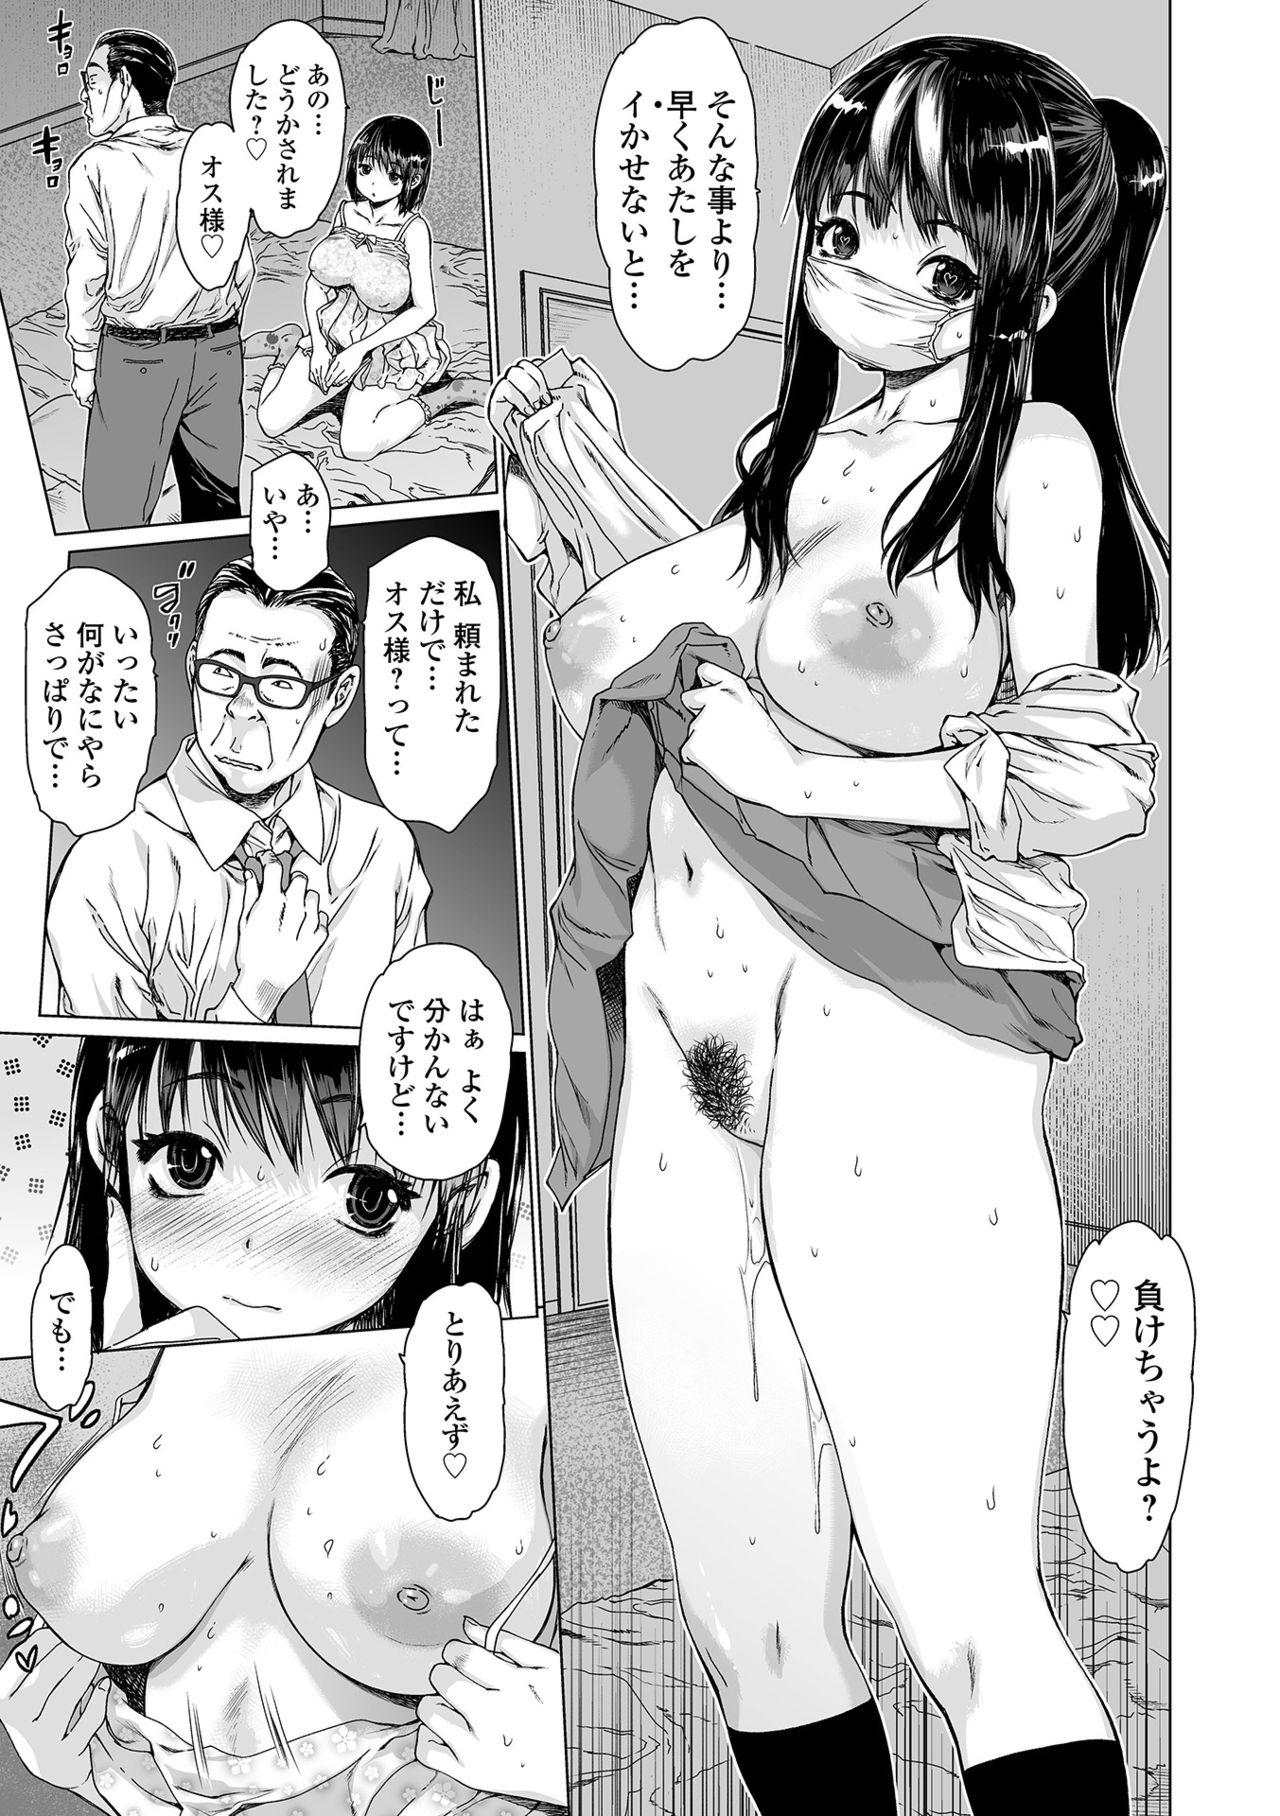 COMIC Shigekiteki SQUIRT!! Vol. 25 88